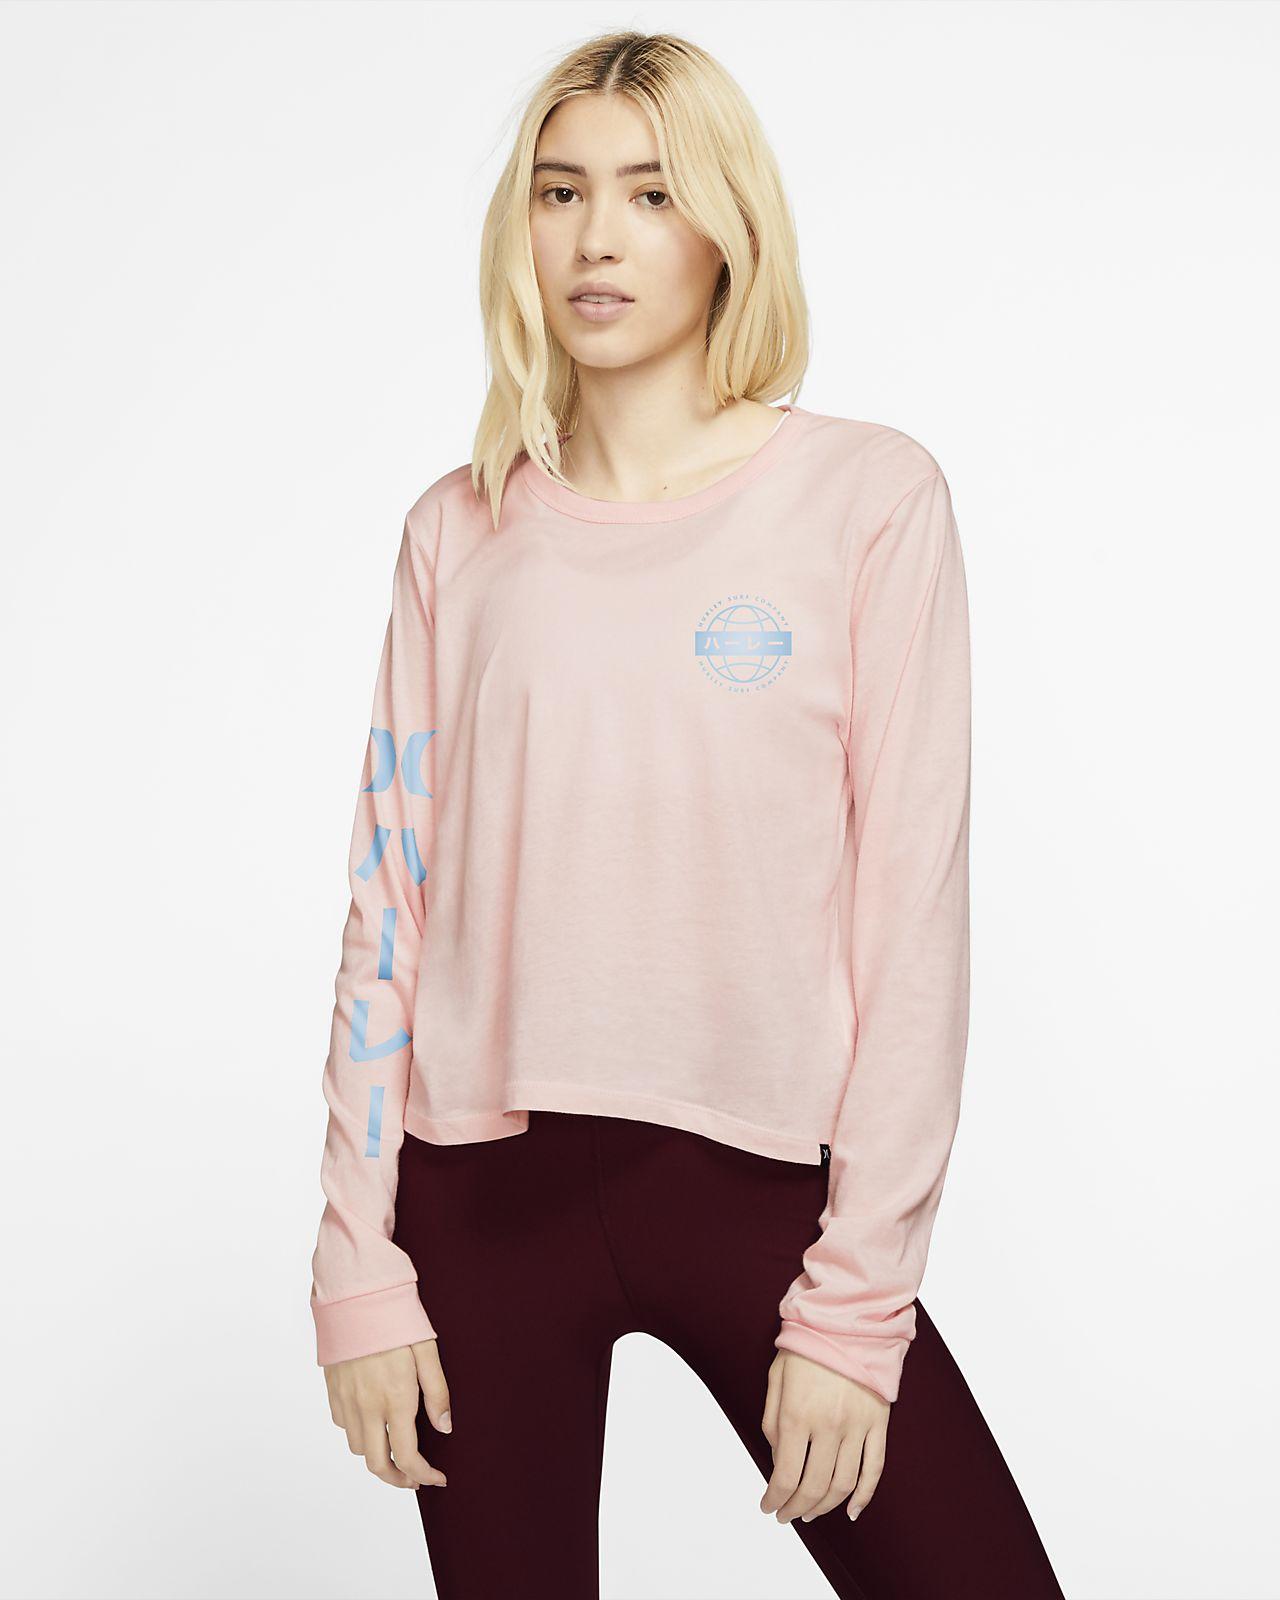 Camisola de manga comprida Hurley Global Perfect para mulher